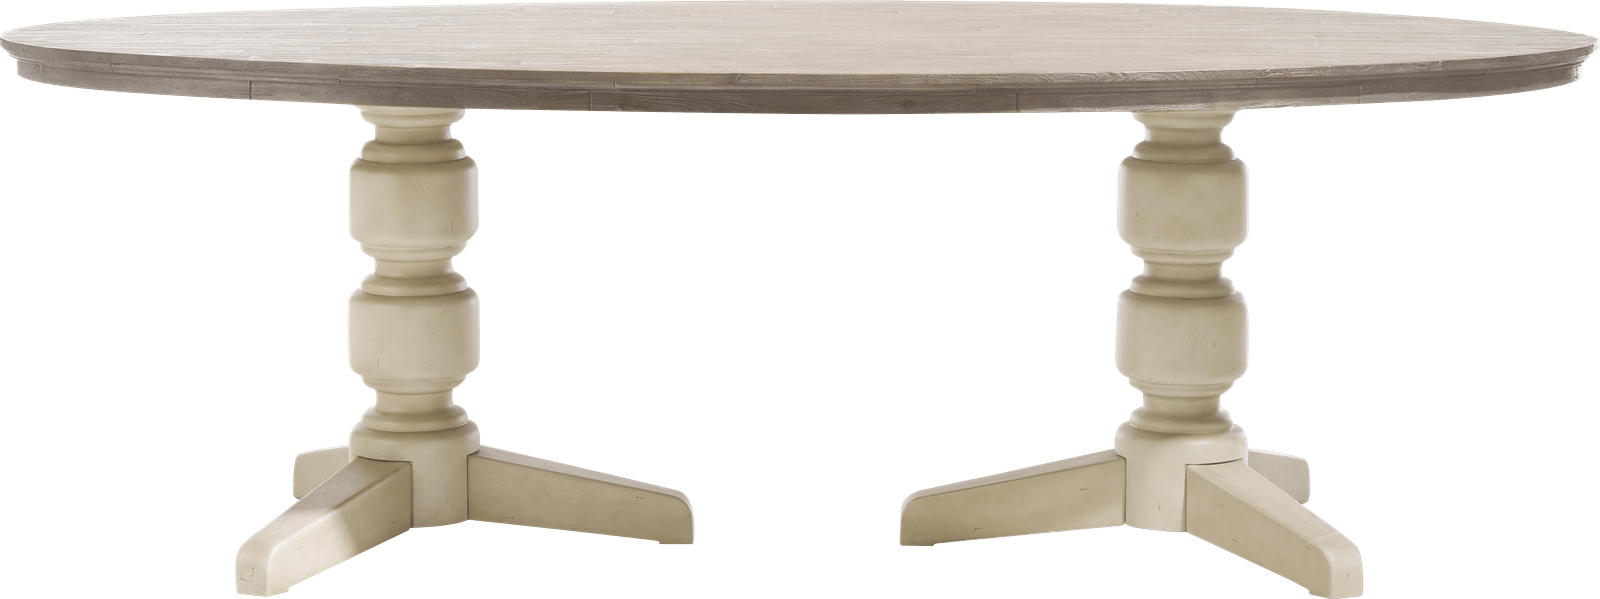 Le Port table ovale 5 x 5 cm